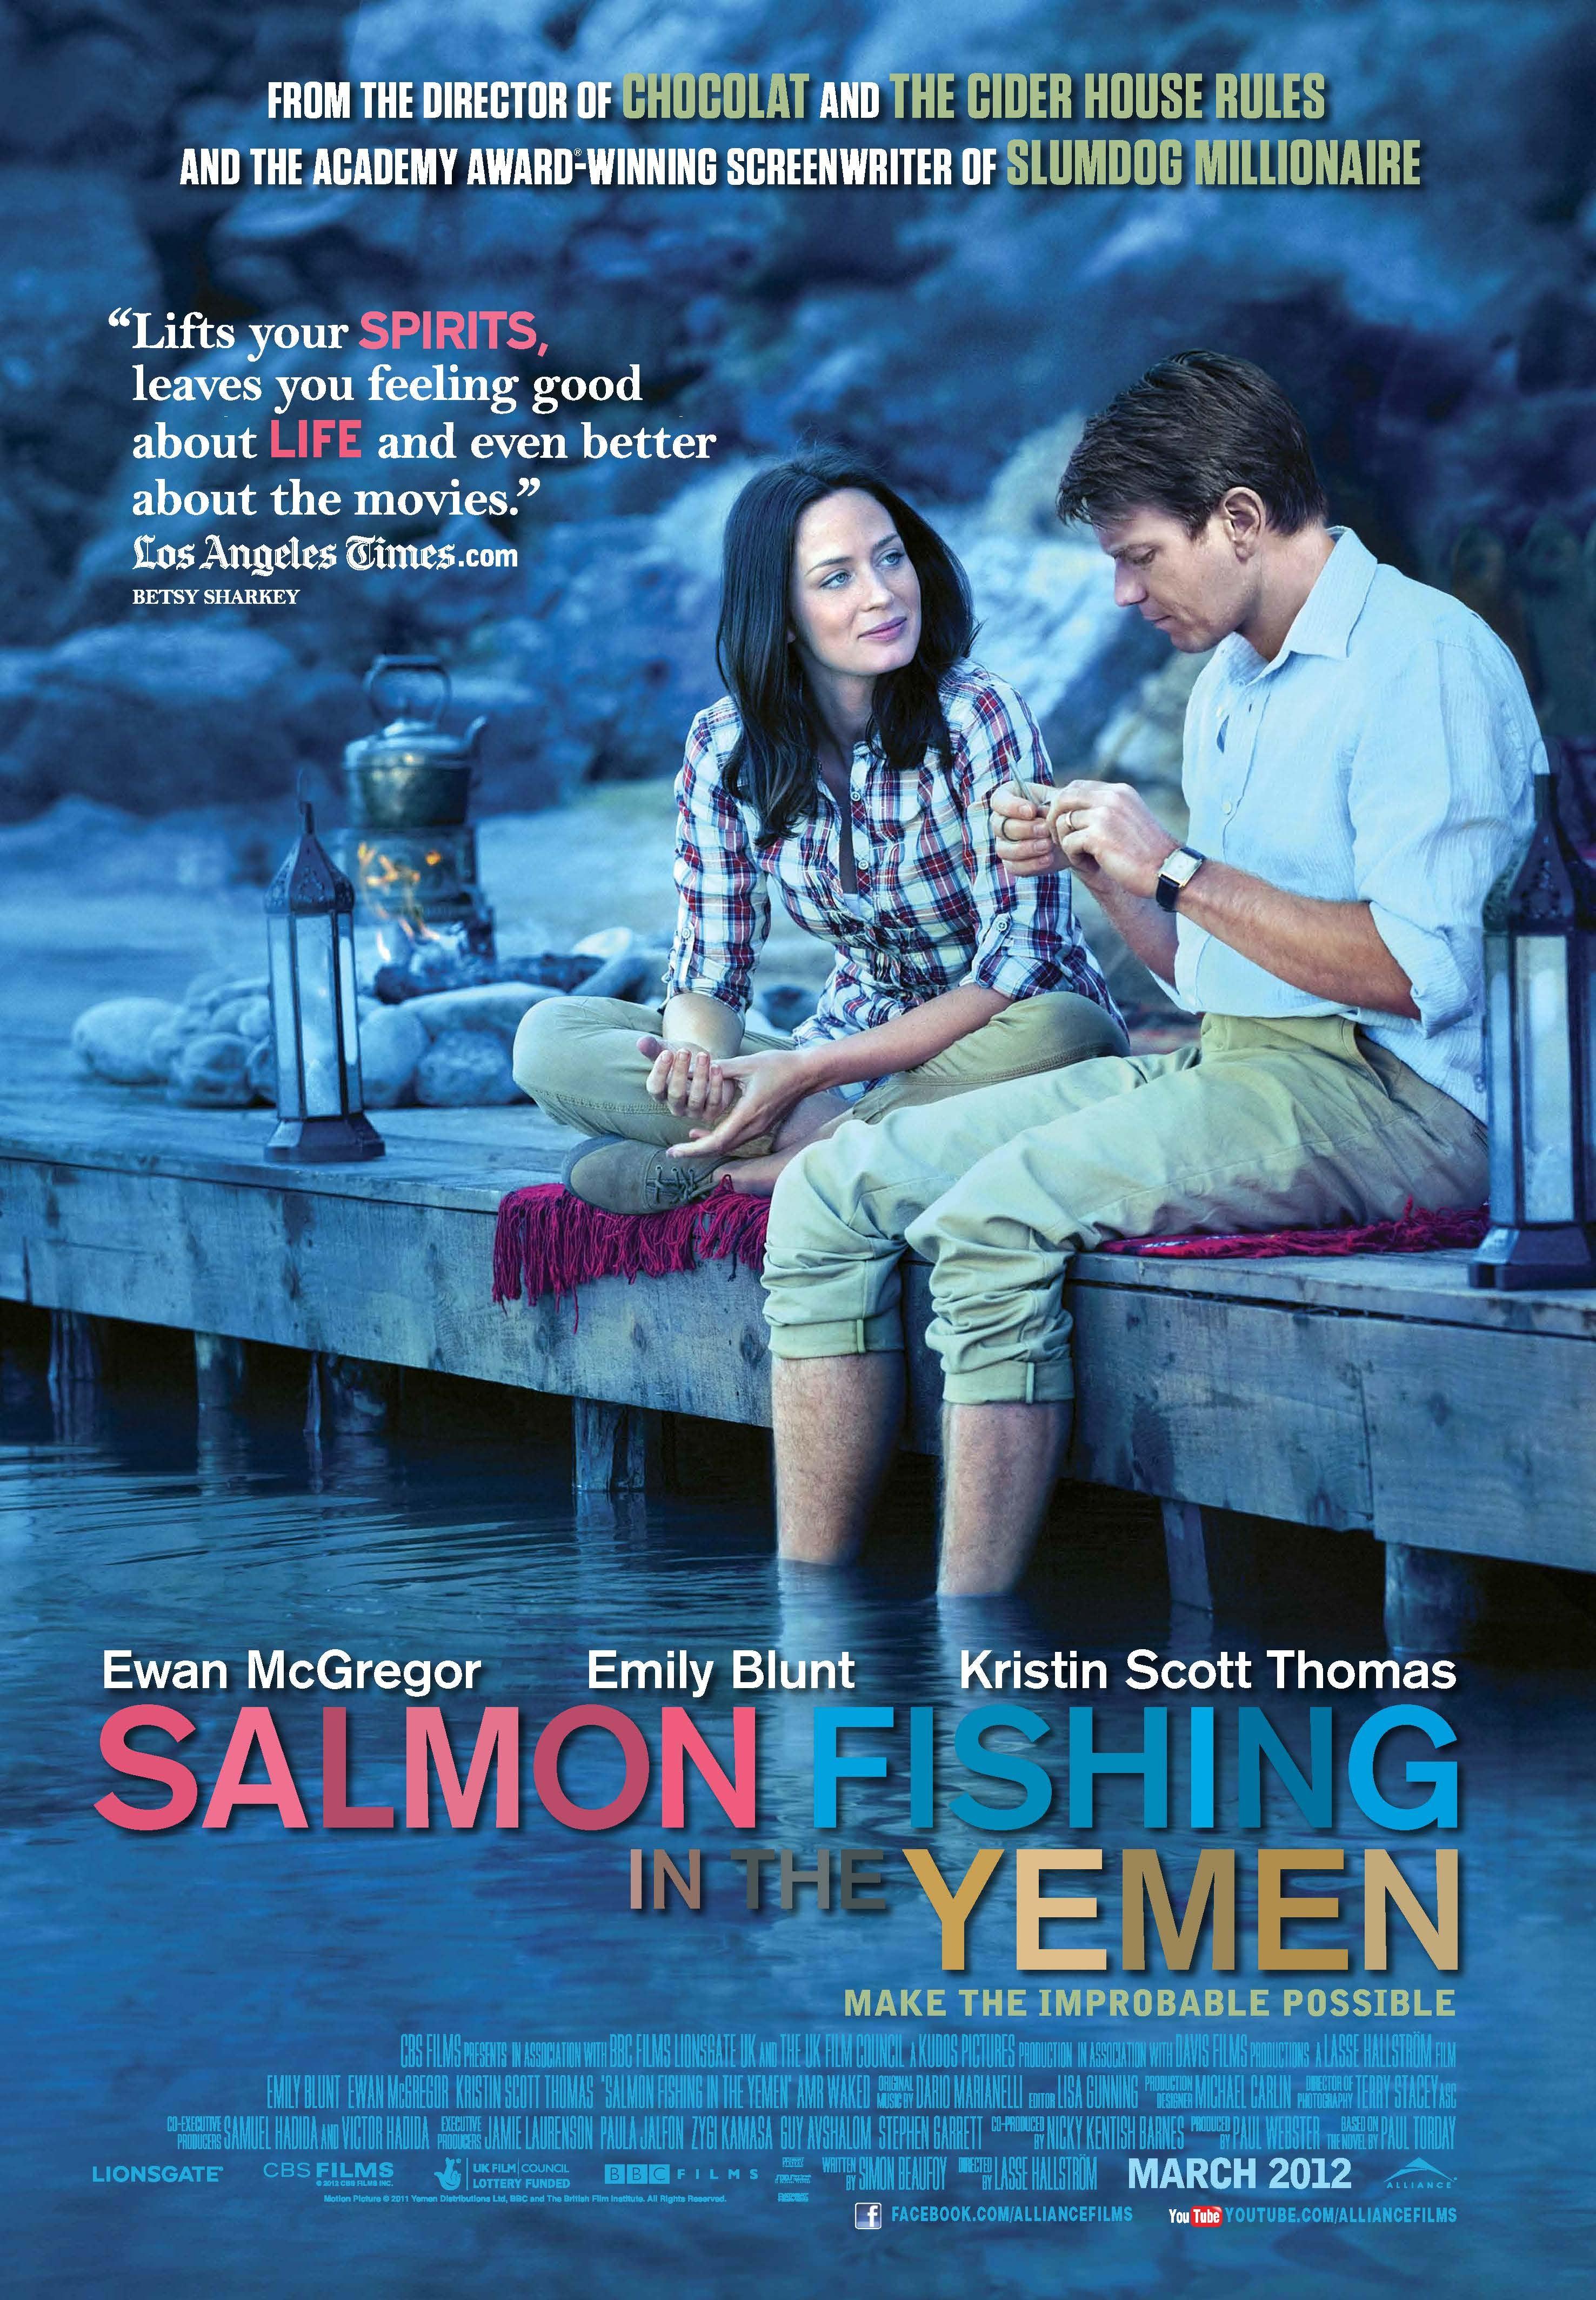 Salmon fishing in the yemen golden globes for Salmon fishing in the yemen